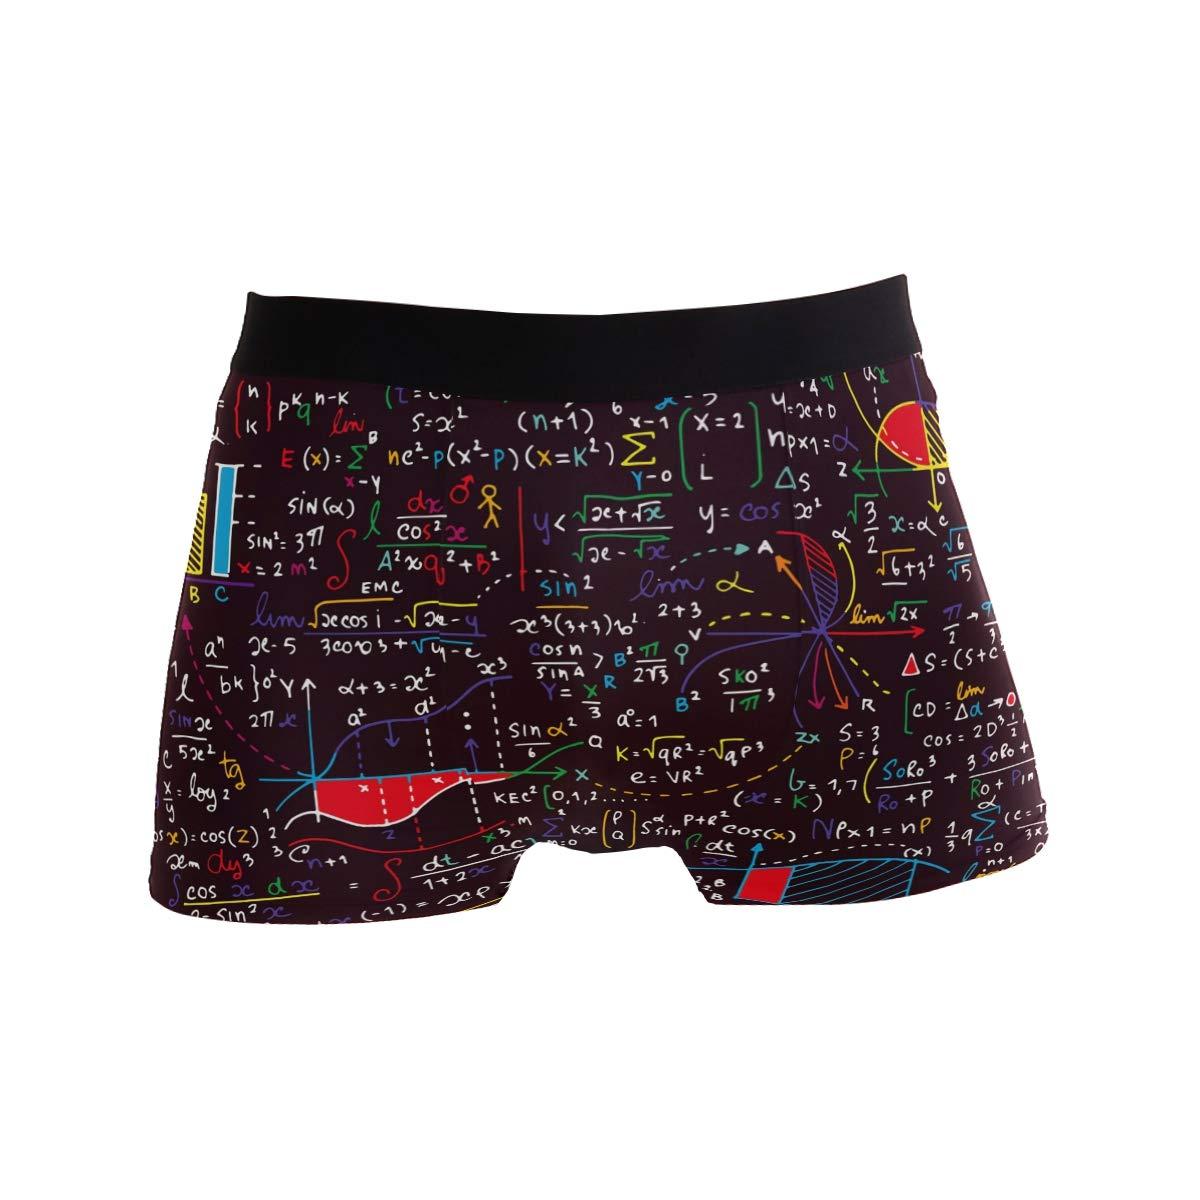 ZZKKO Math Formula Mens Boxer Briefs Underwear Breathable Stretch Boxer Trunk with Pouch S-XL